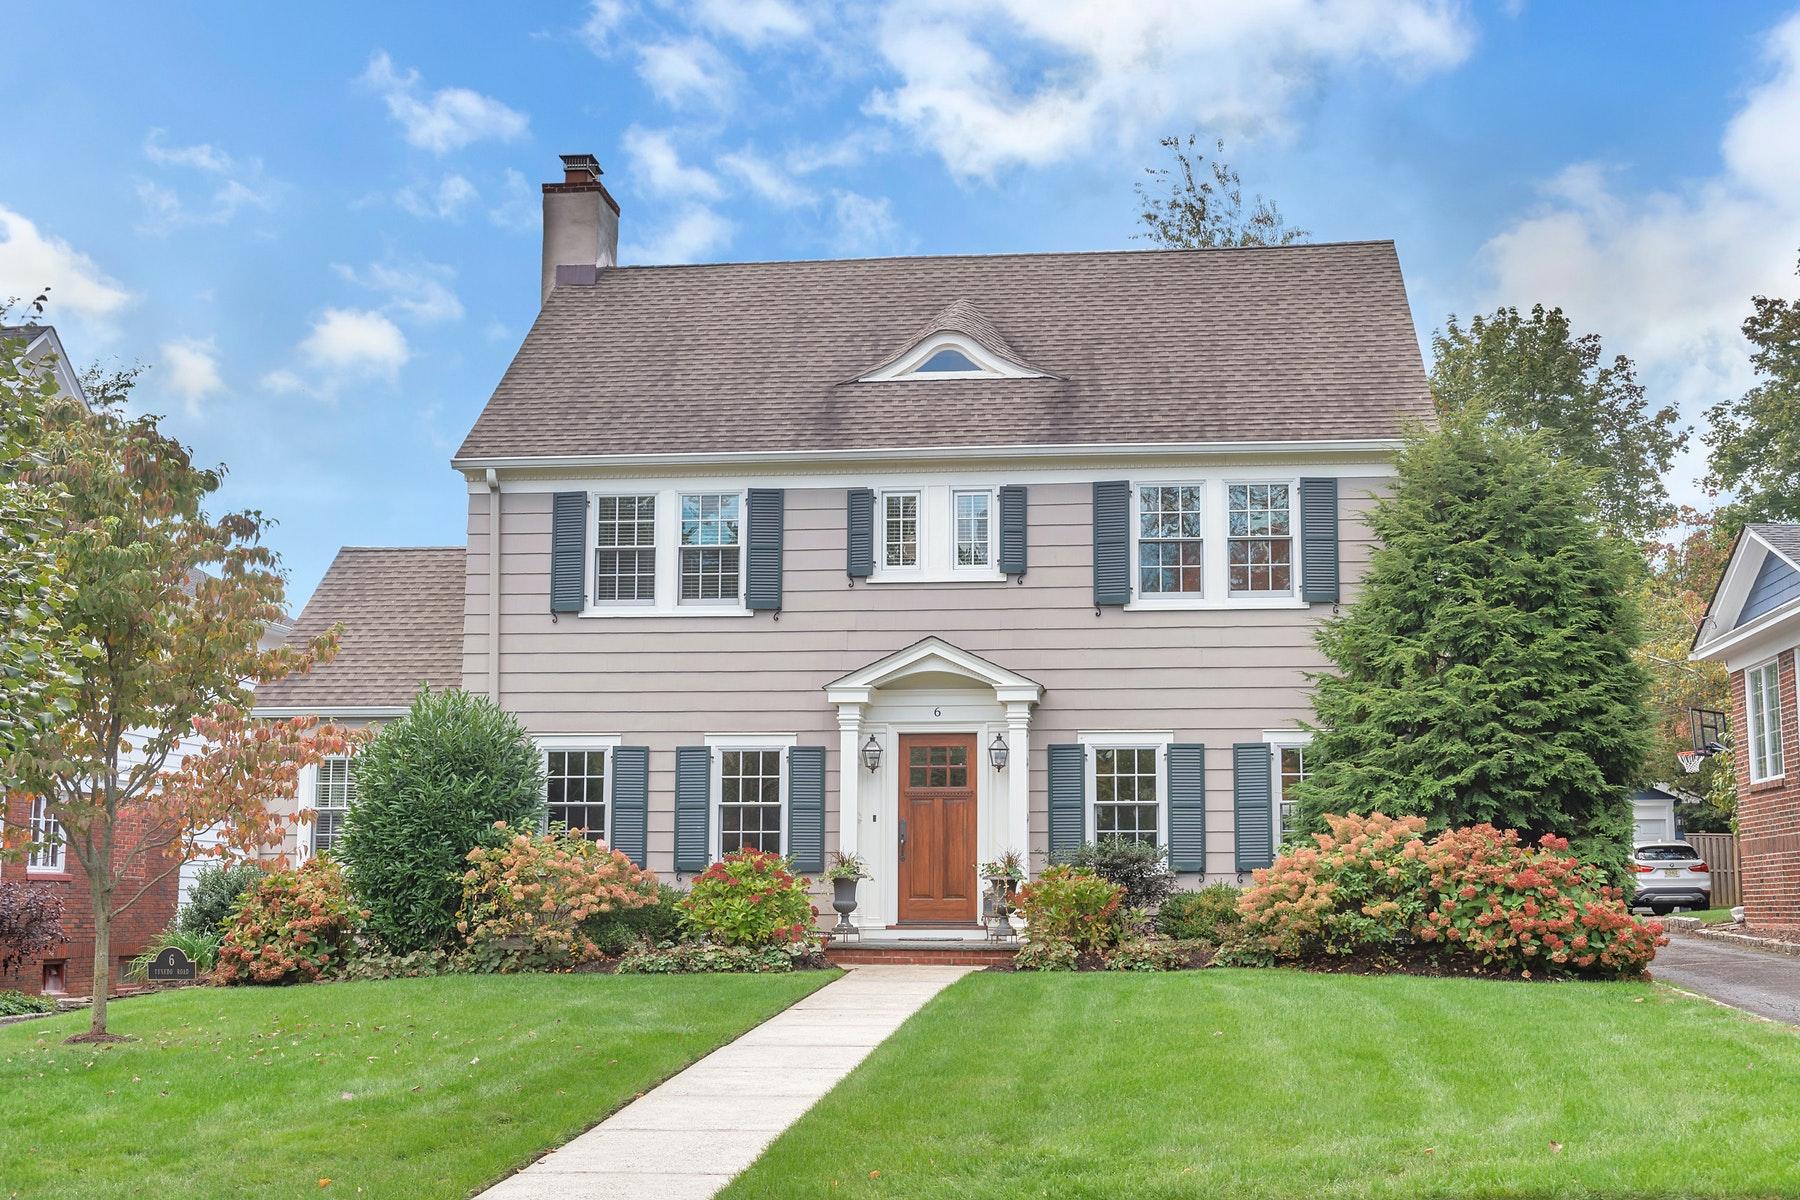 Single Family Homes для того Продажа на Impeccable Center Hall Colonial! 6 Tuxedo Road, Glen Ridge, Нью-Джерси 07028 Соединенные Штаты